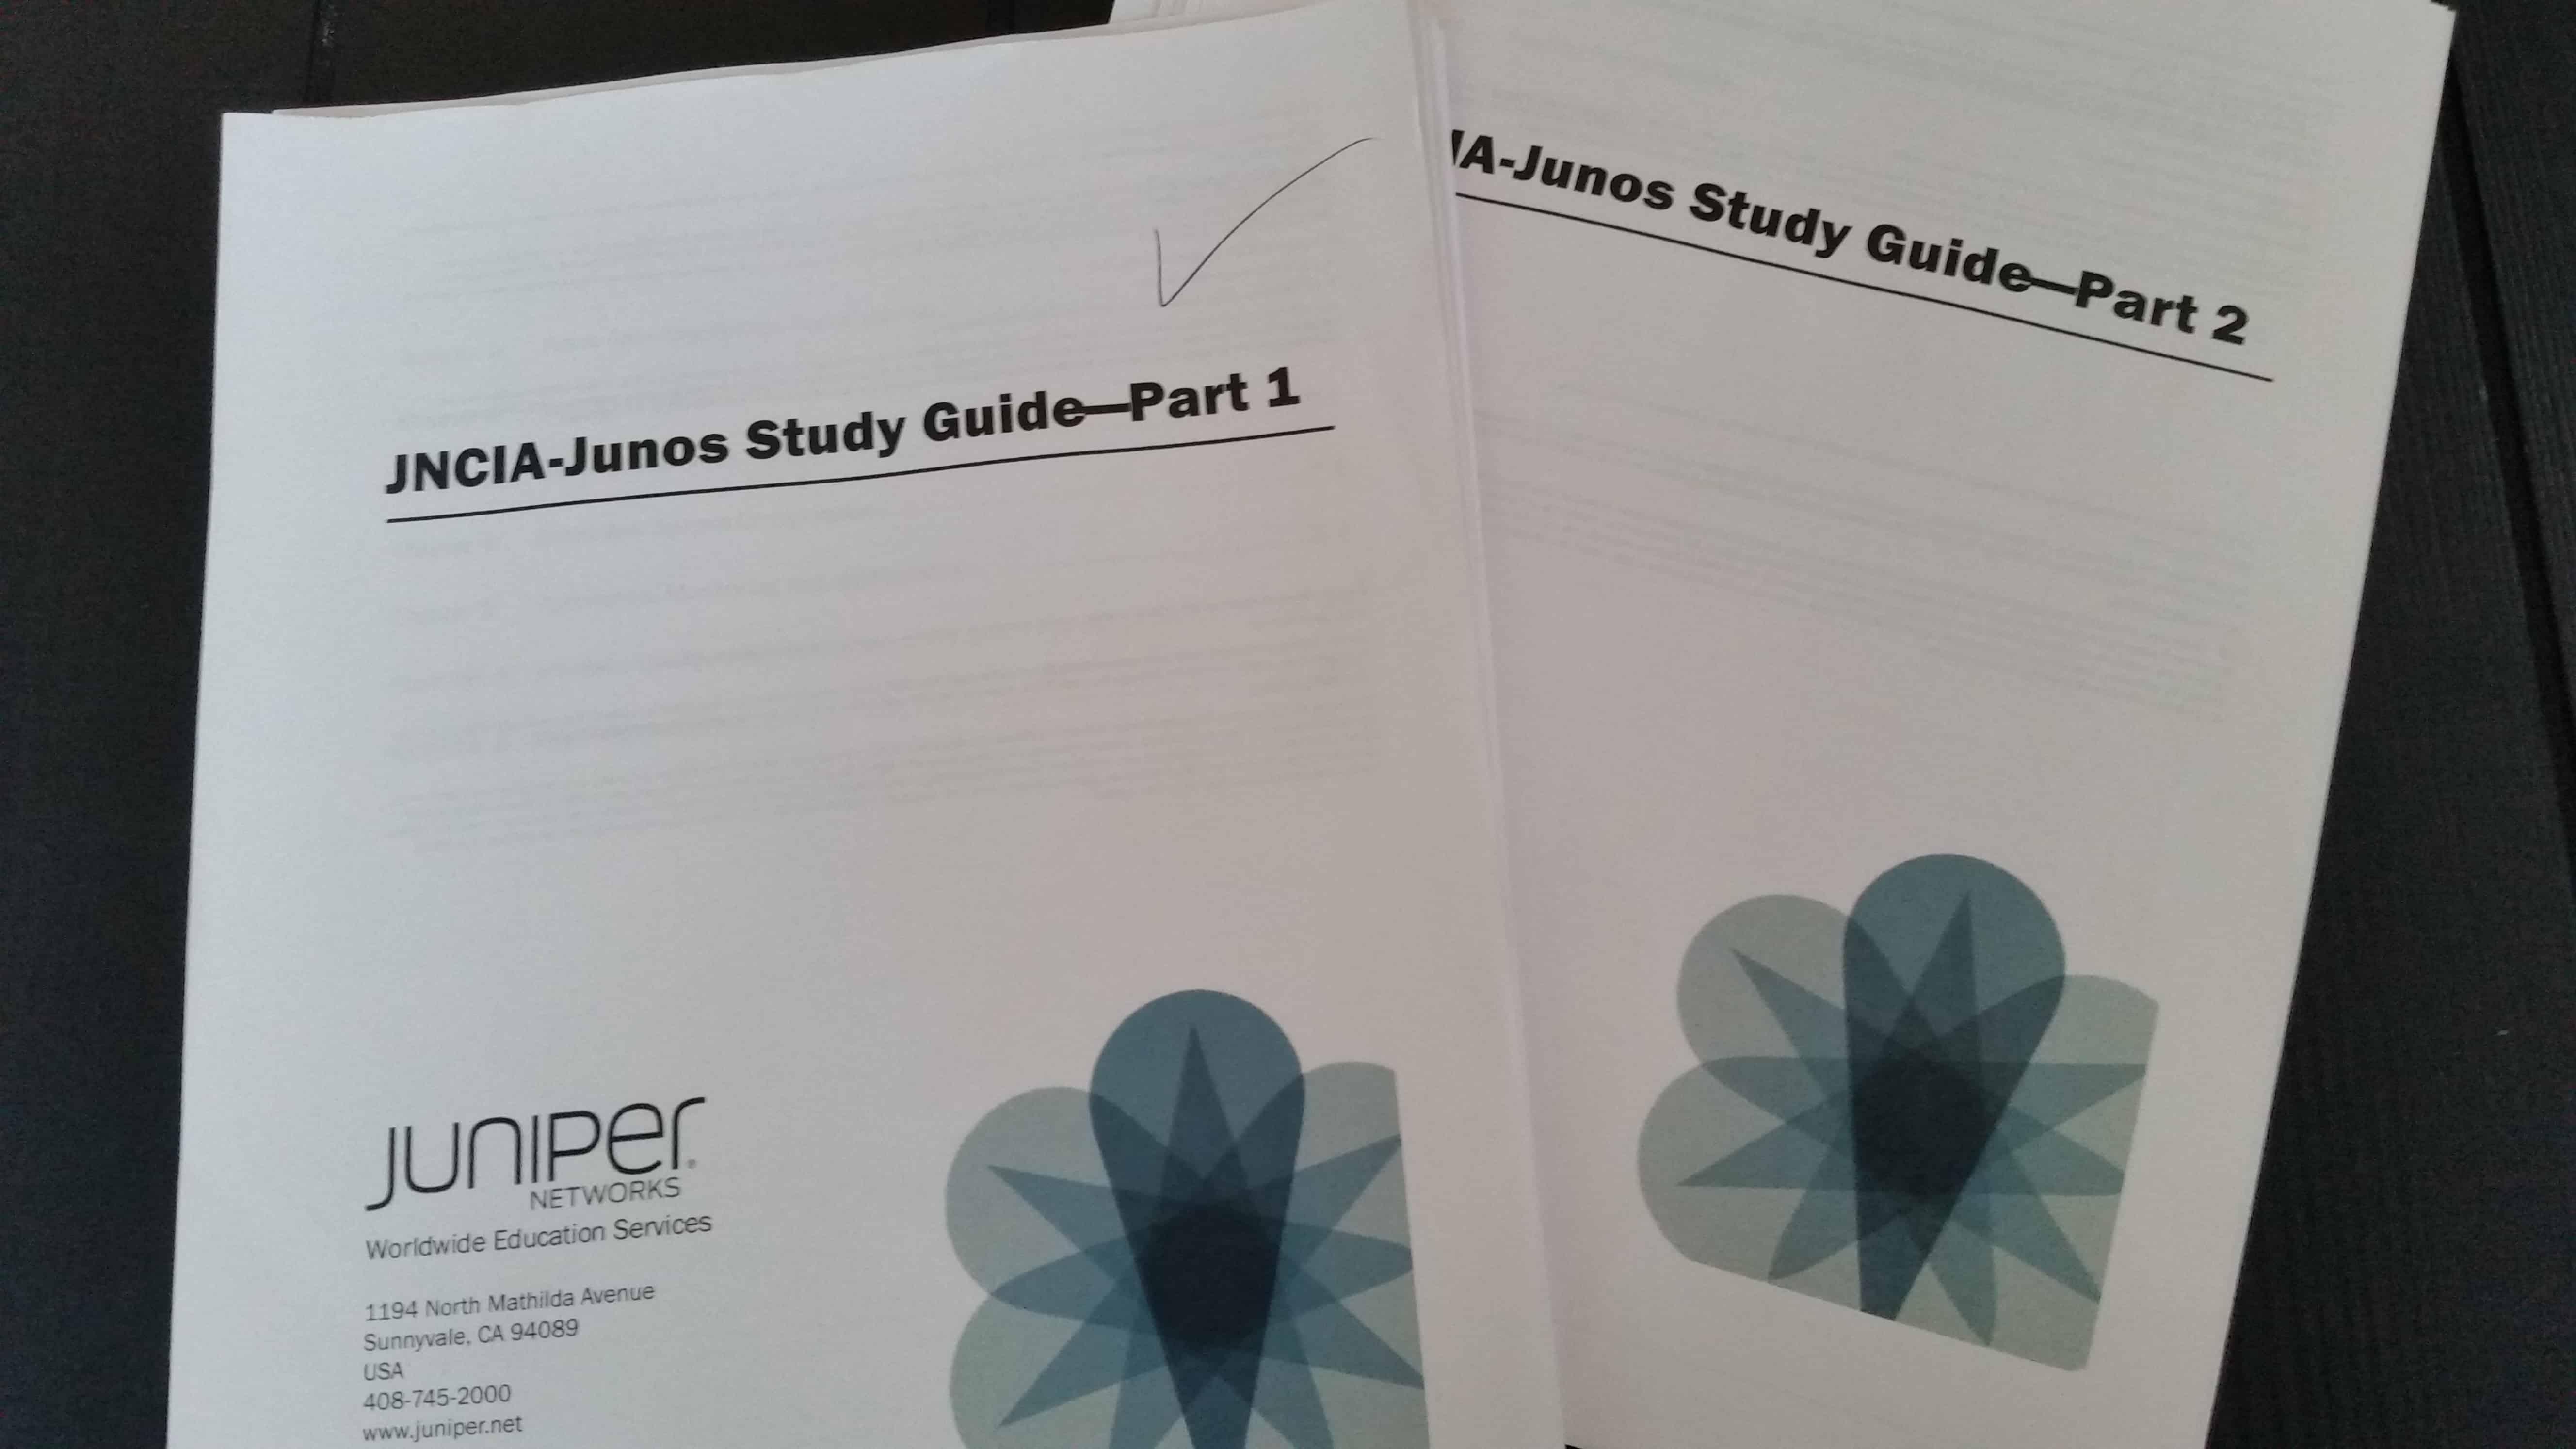 Juniper Tips from the JNCIA-Junos Study Guides